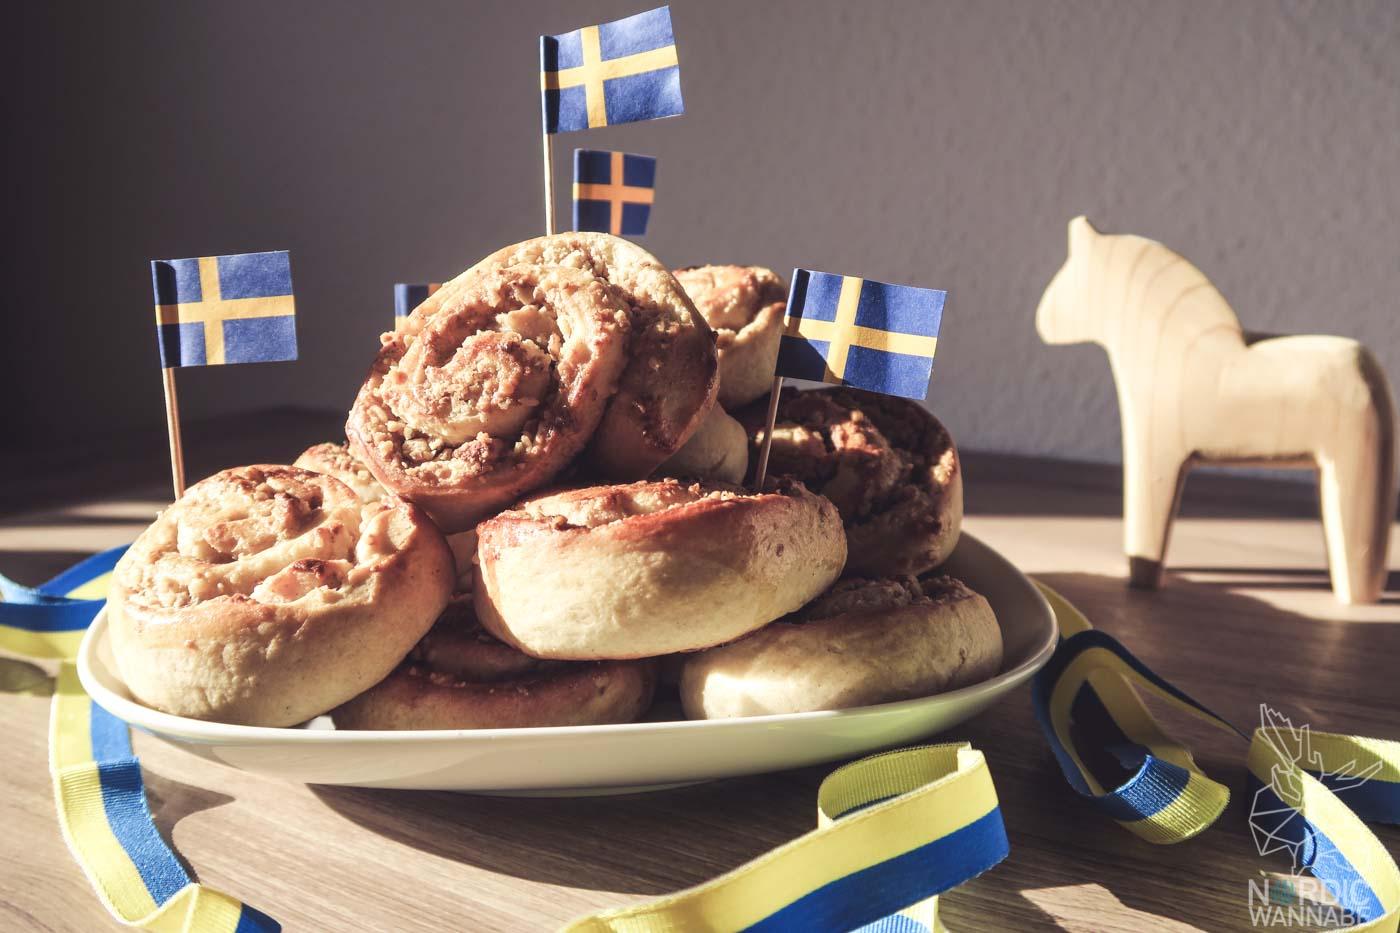 Mittsommer-Party feiern, Midsommar, Party , Rezept, Schweden, MIttsommer-Rezepte, Mittsommer-Dekoration